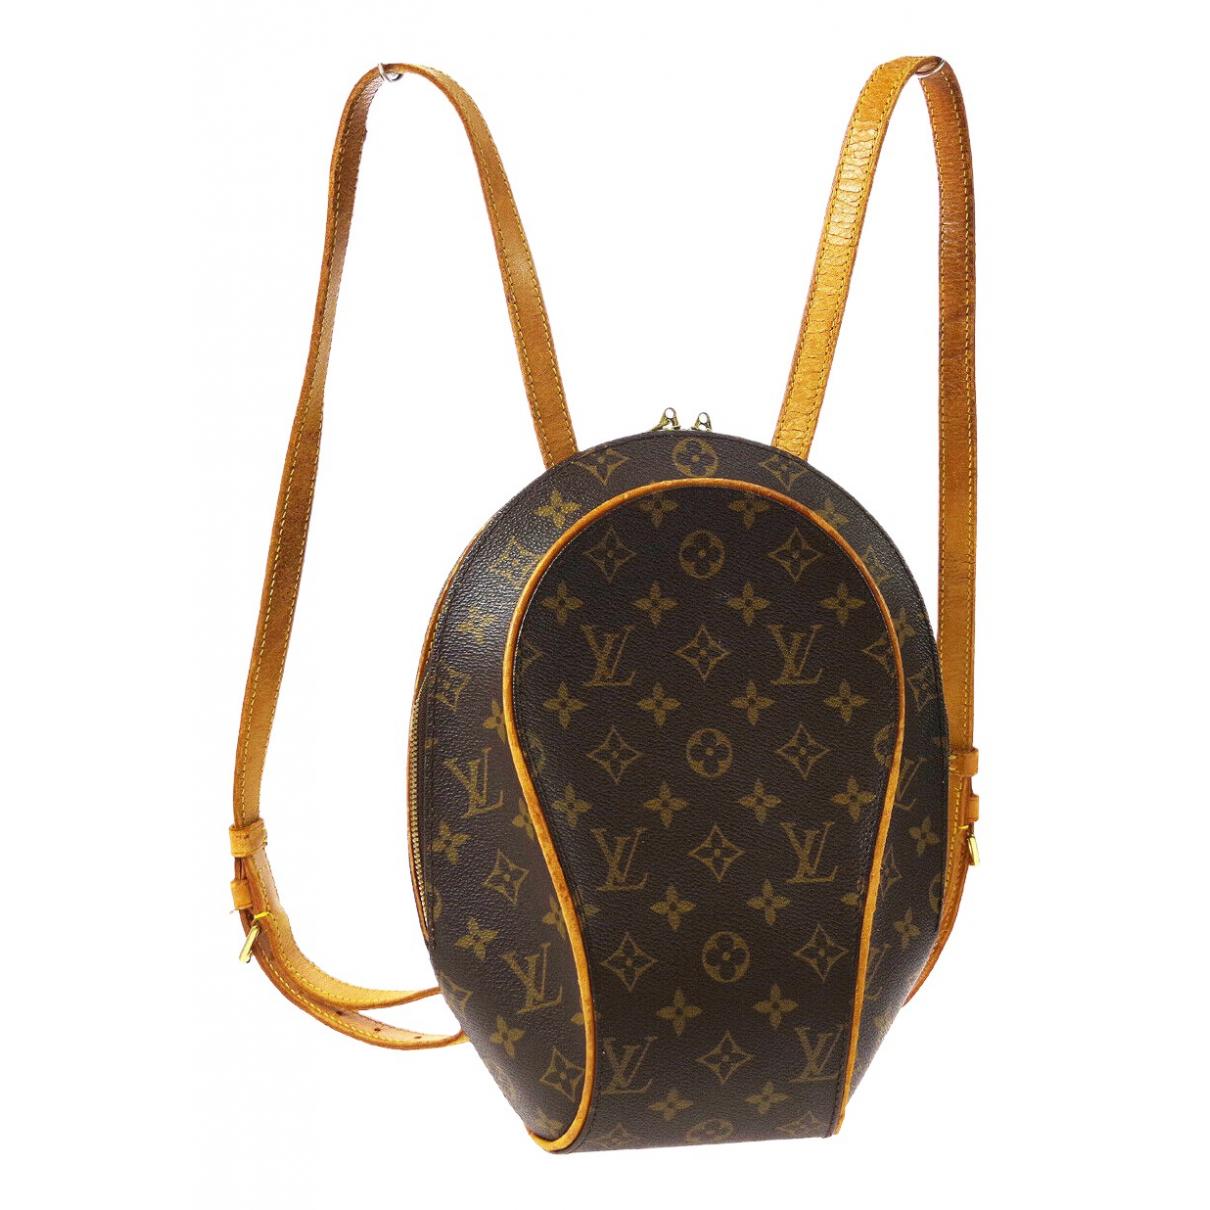 Mochila Ellipse de Lona Louis Vuitton